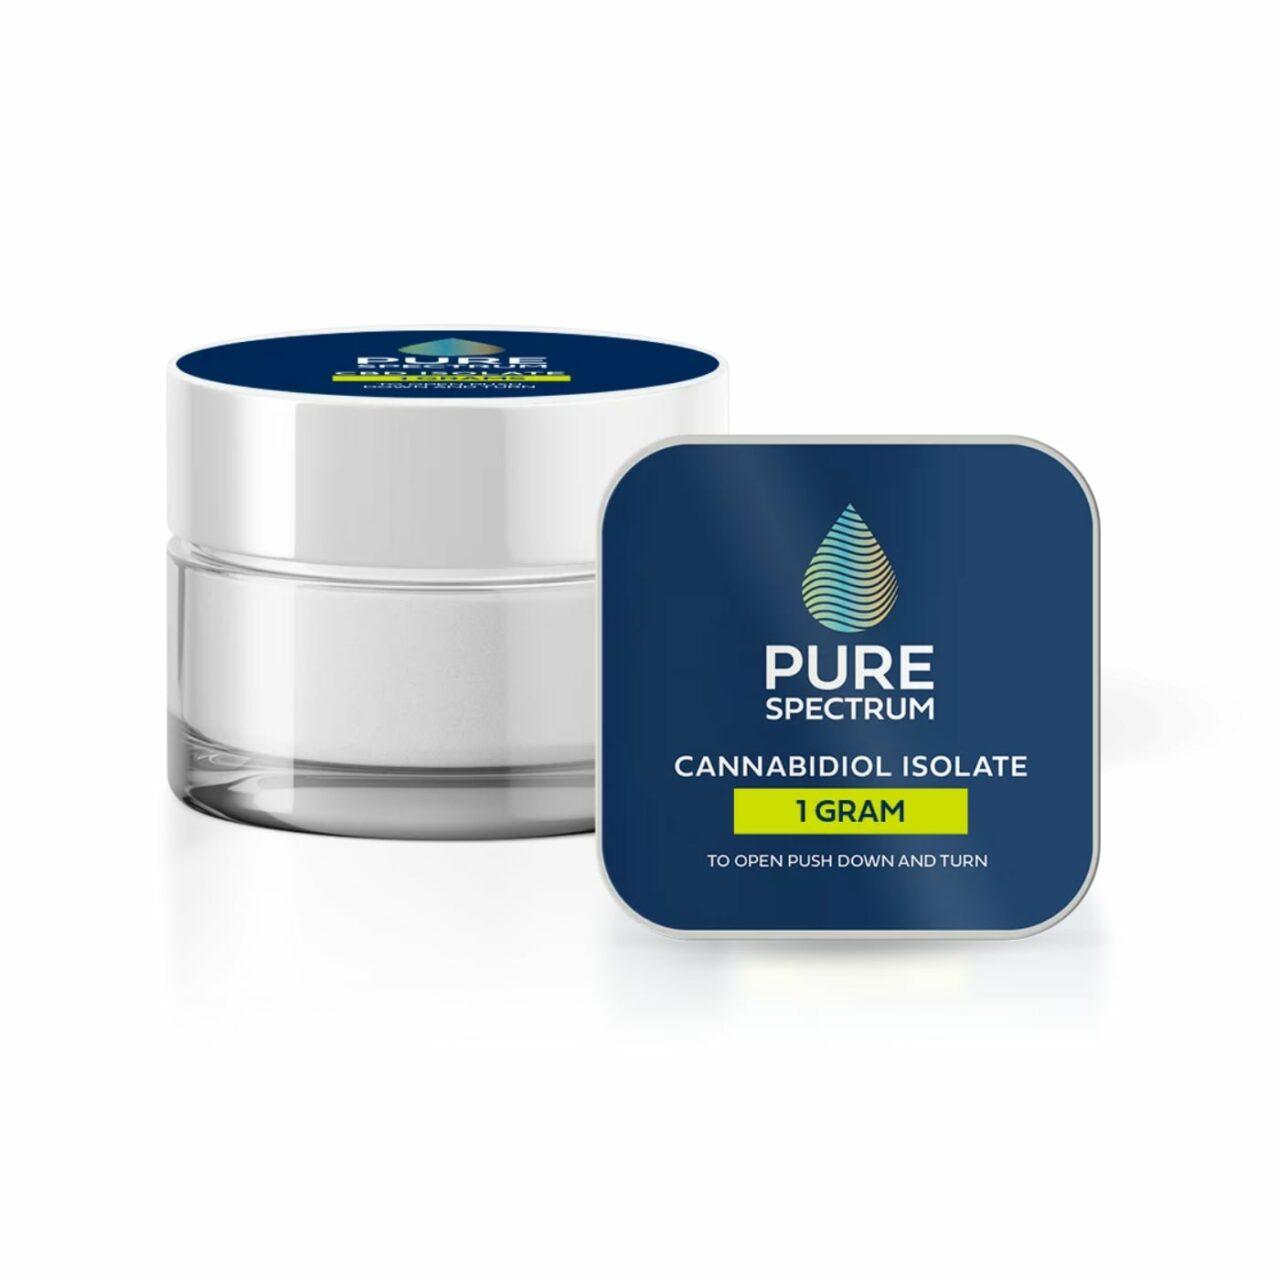 Pure Spectrum, 99% CBD Isolate Powder, 1g, 1000mg of CBD2